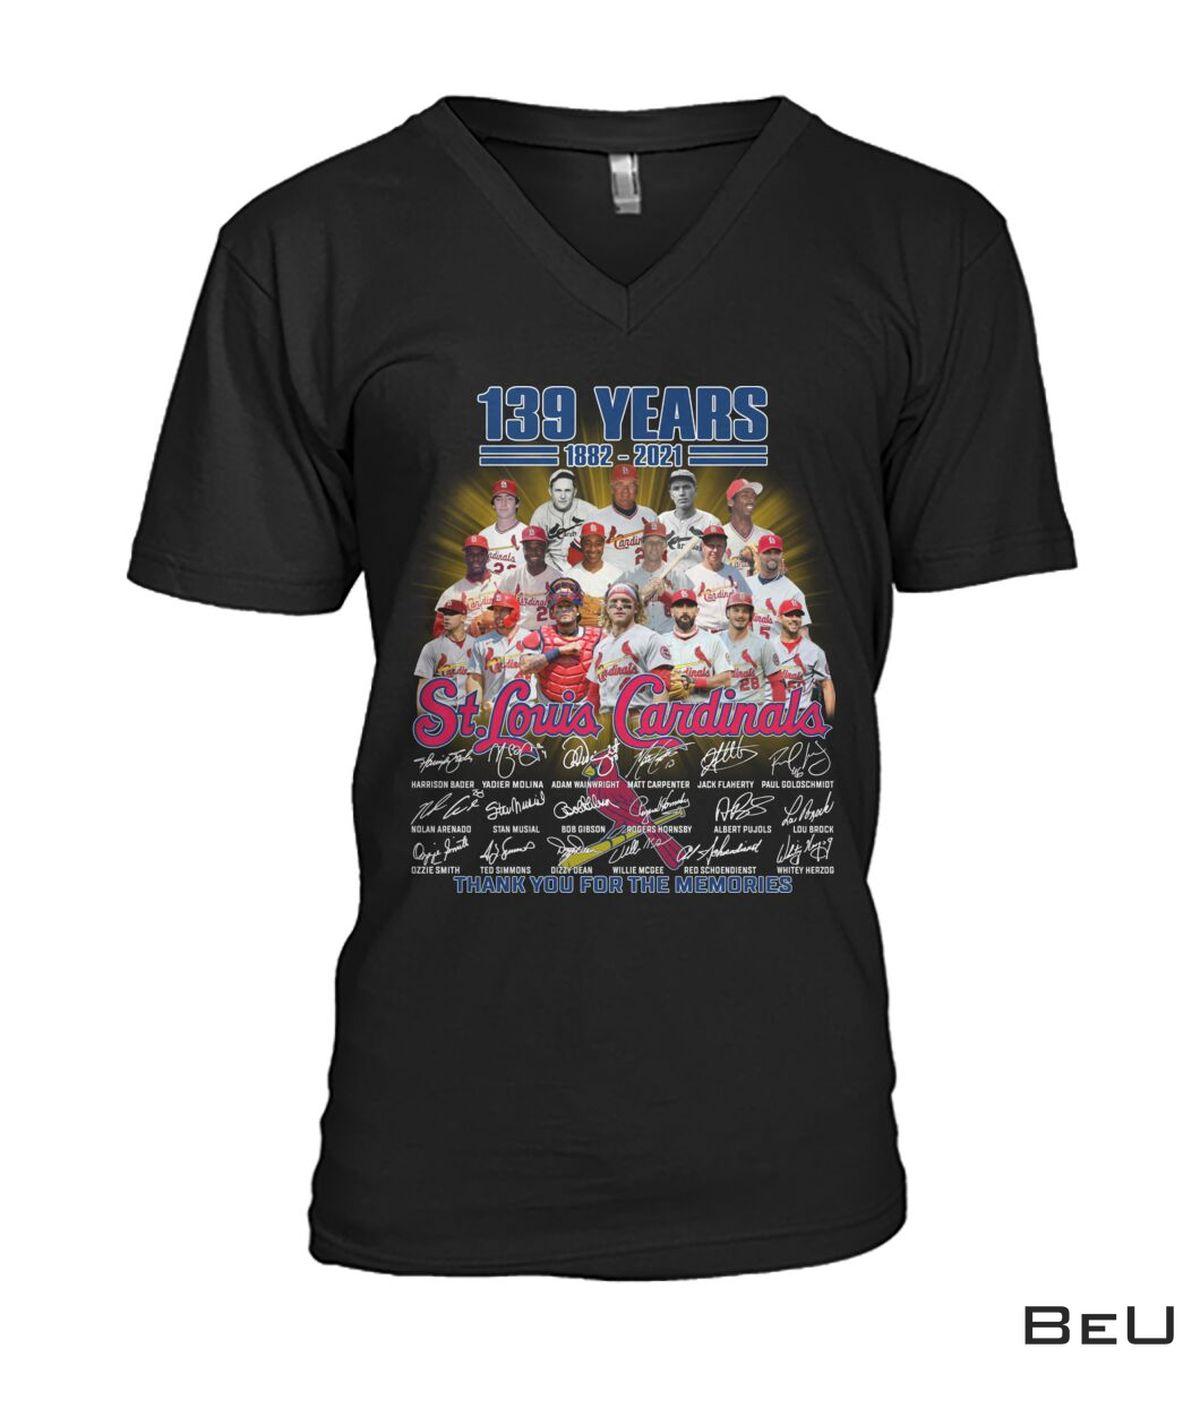 Best Gift St Louis Cardinals 139 Years Anniversary Shirt